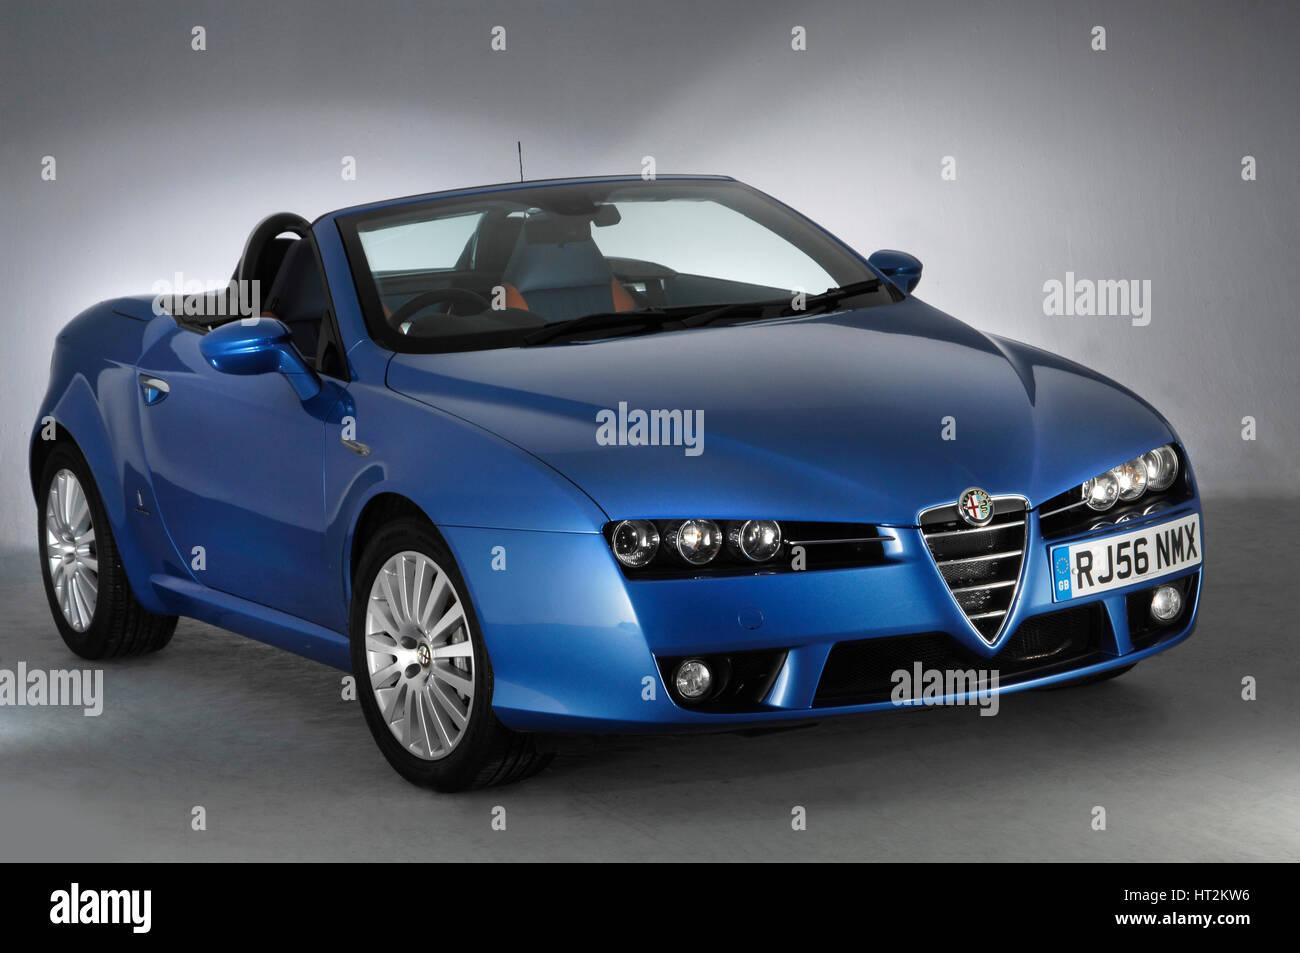 2006-Alfa Romeo Spider. Künstler: unbekannt. Stockbild